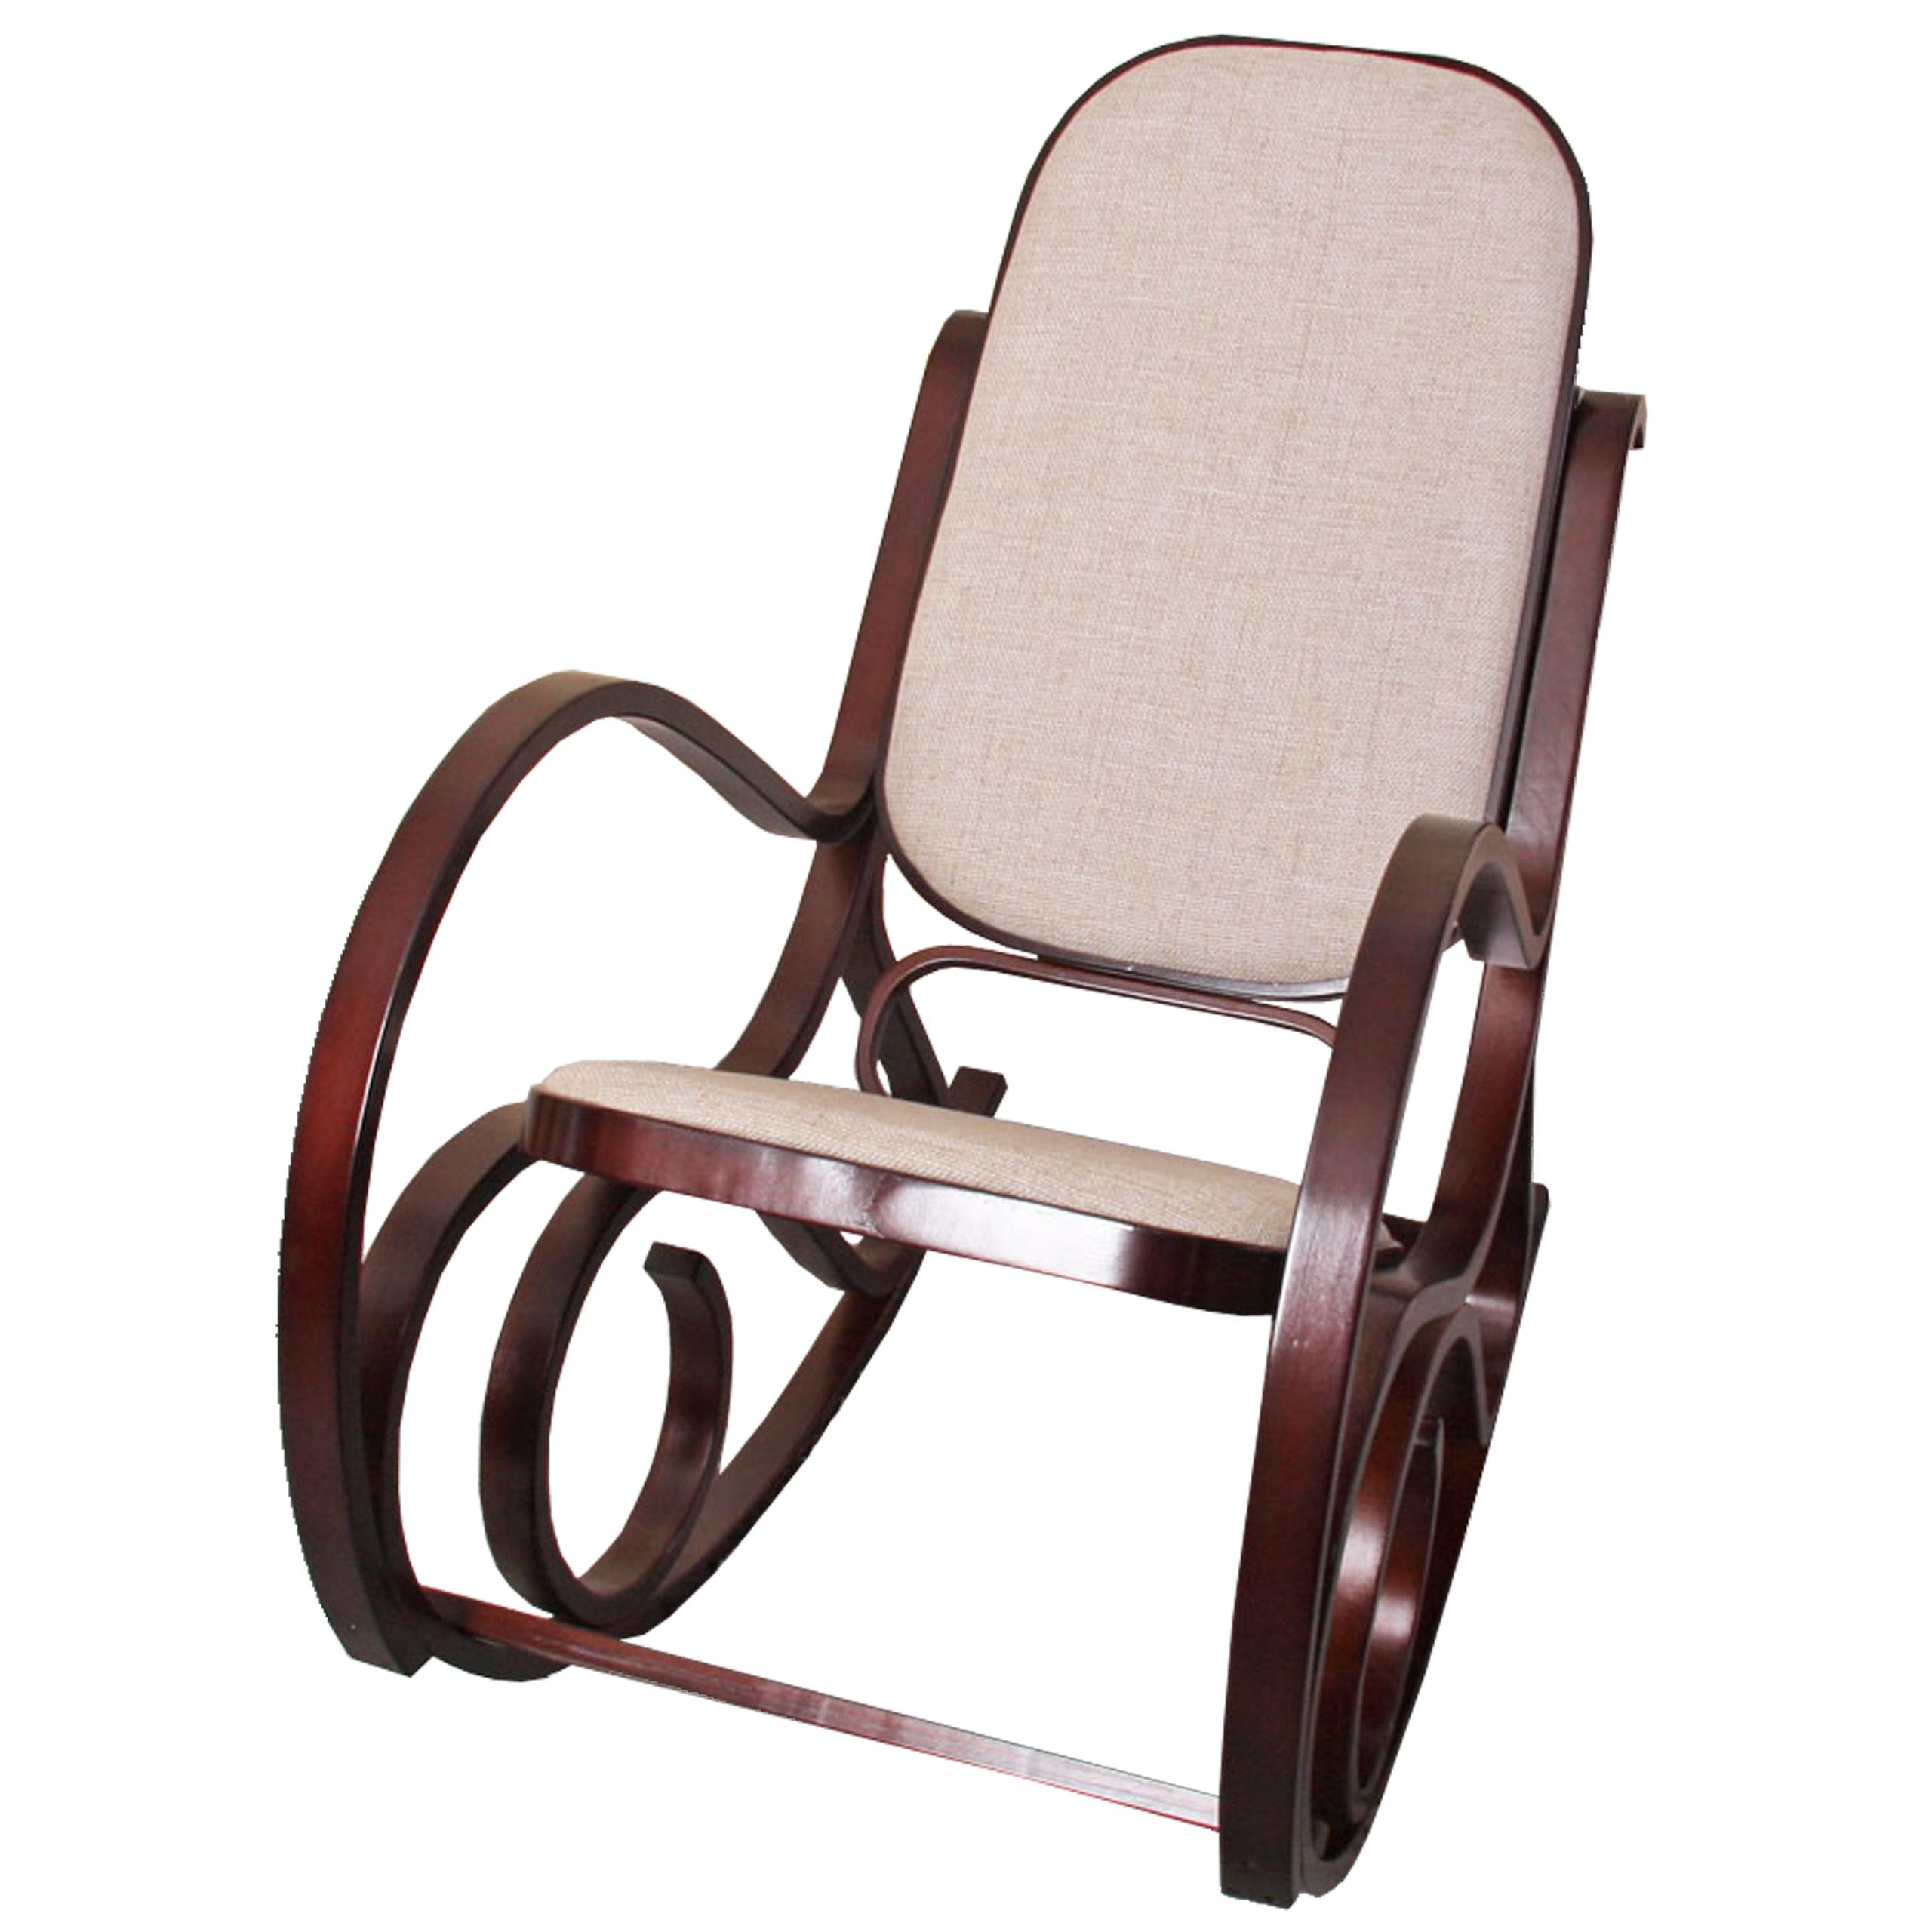 schwingsessel schaukelstuhl m41 aus holz walnuss stoff. Black Bedroom Furniture Sets. Home Design Ideas